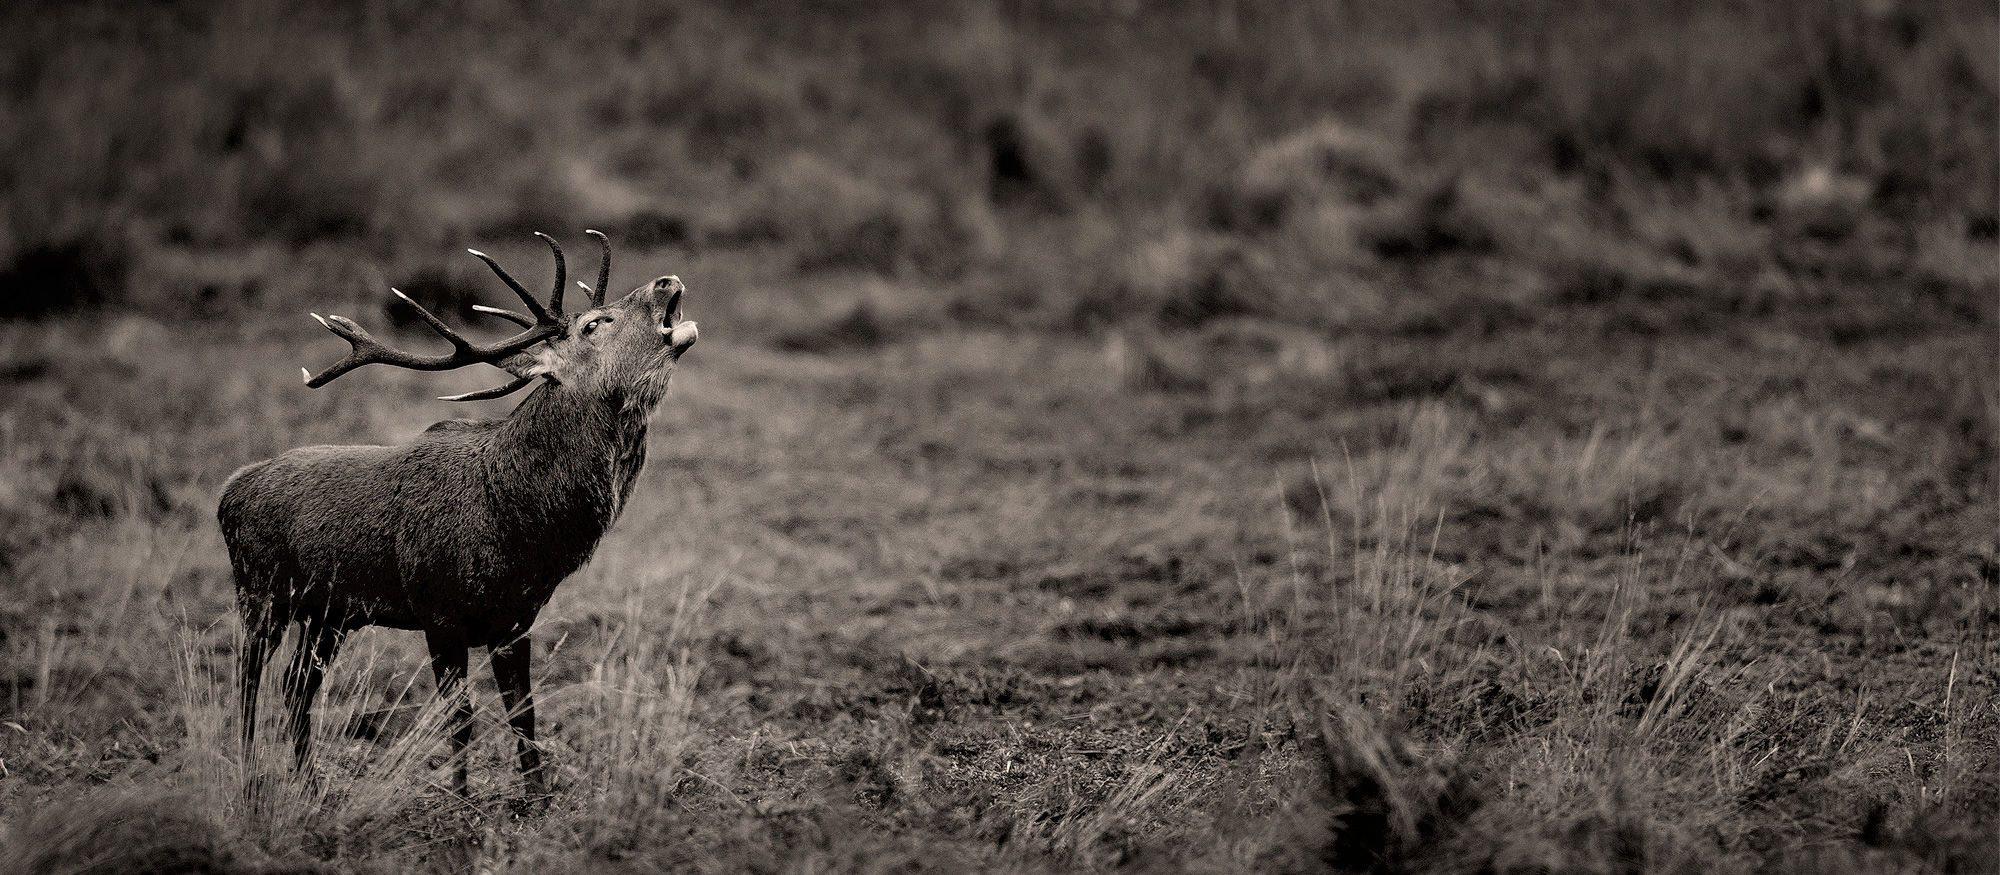 Deer Rut Photography Workshop - Tesni Ward Photography with Bradgate Deer Rut 2021